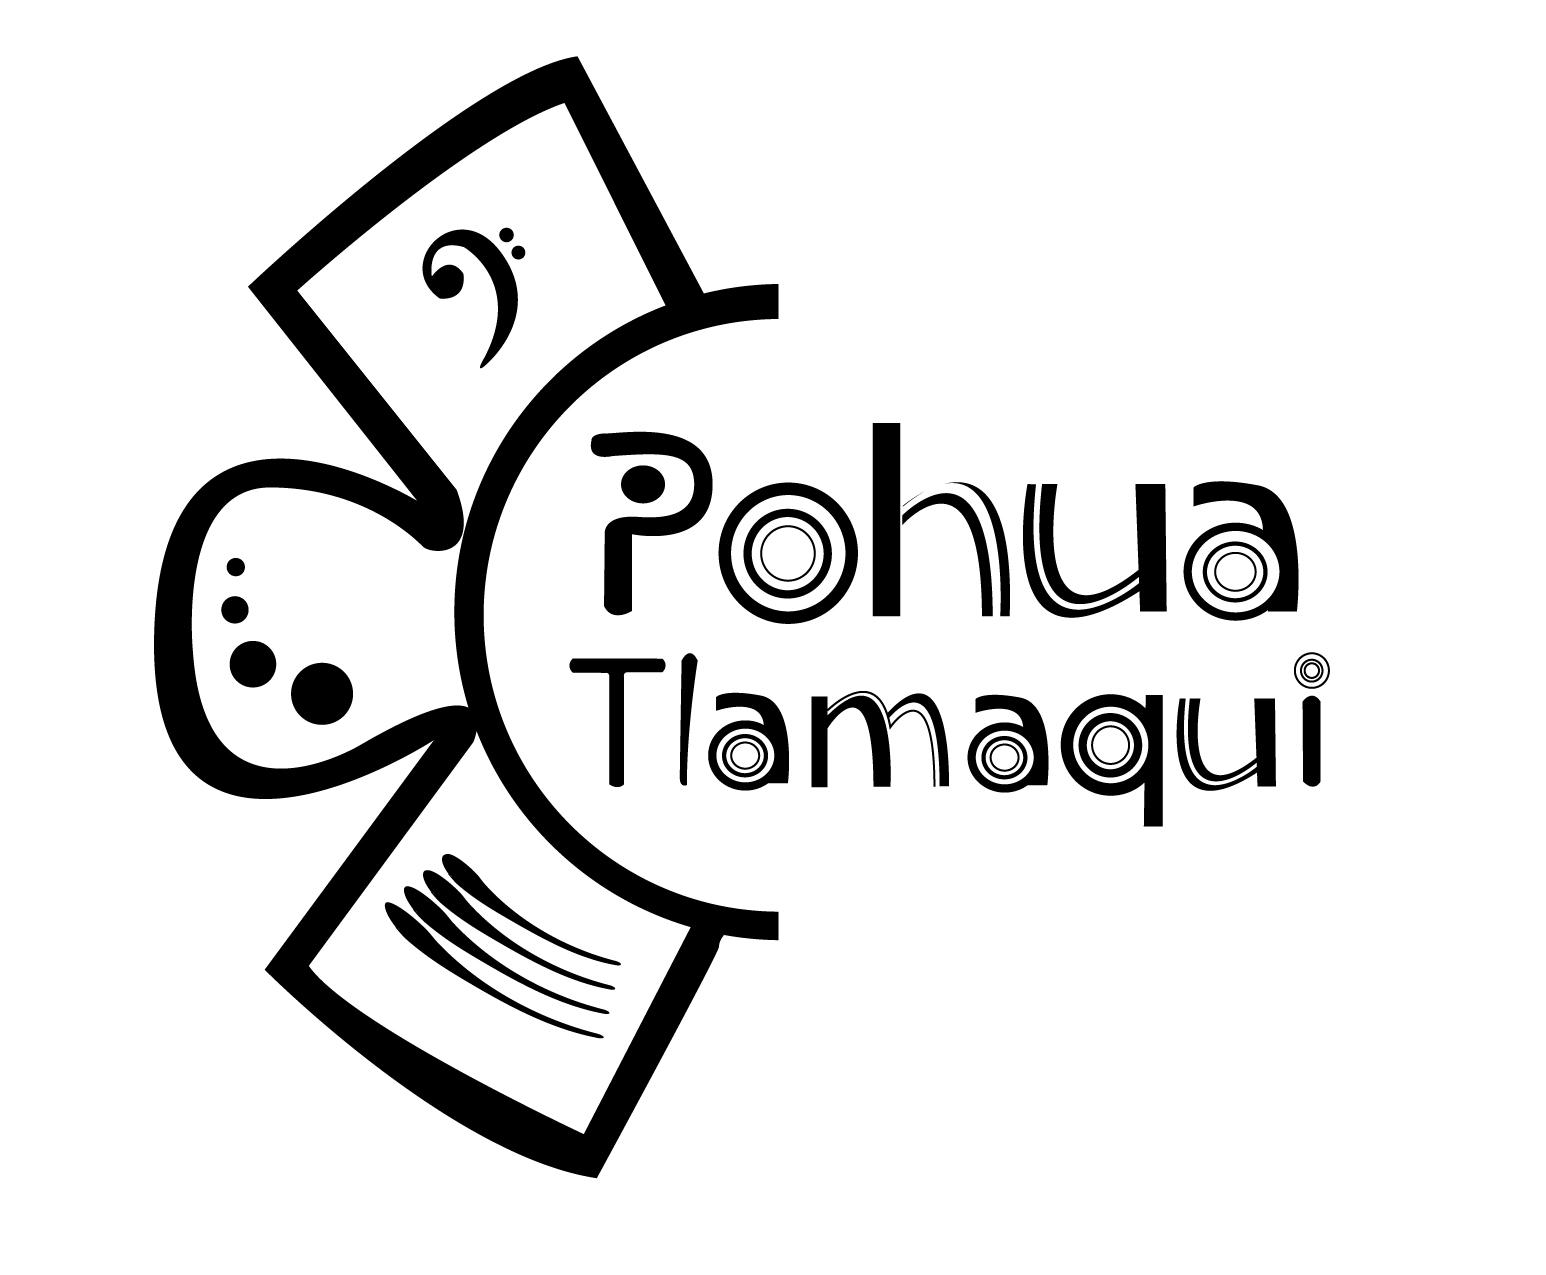 Pohua Tlamaqui